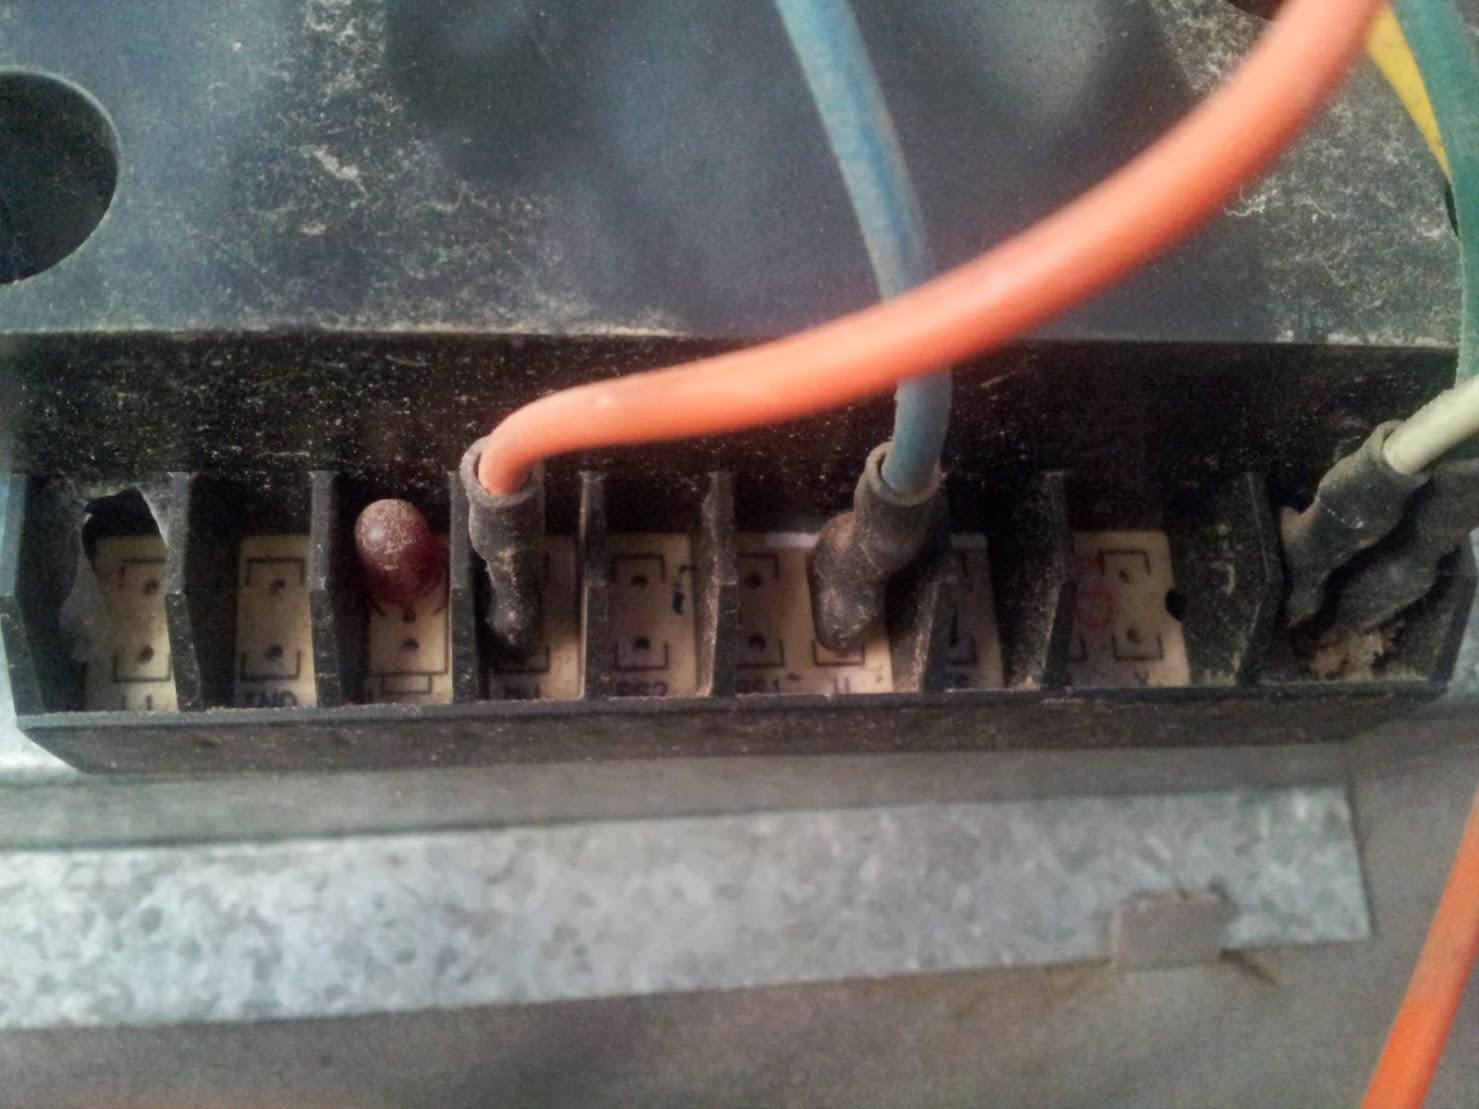 hayward pool heater h250 ed1 | Dr Terrible's House of Bloggable